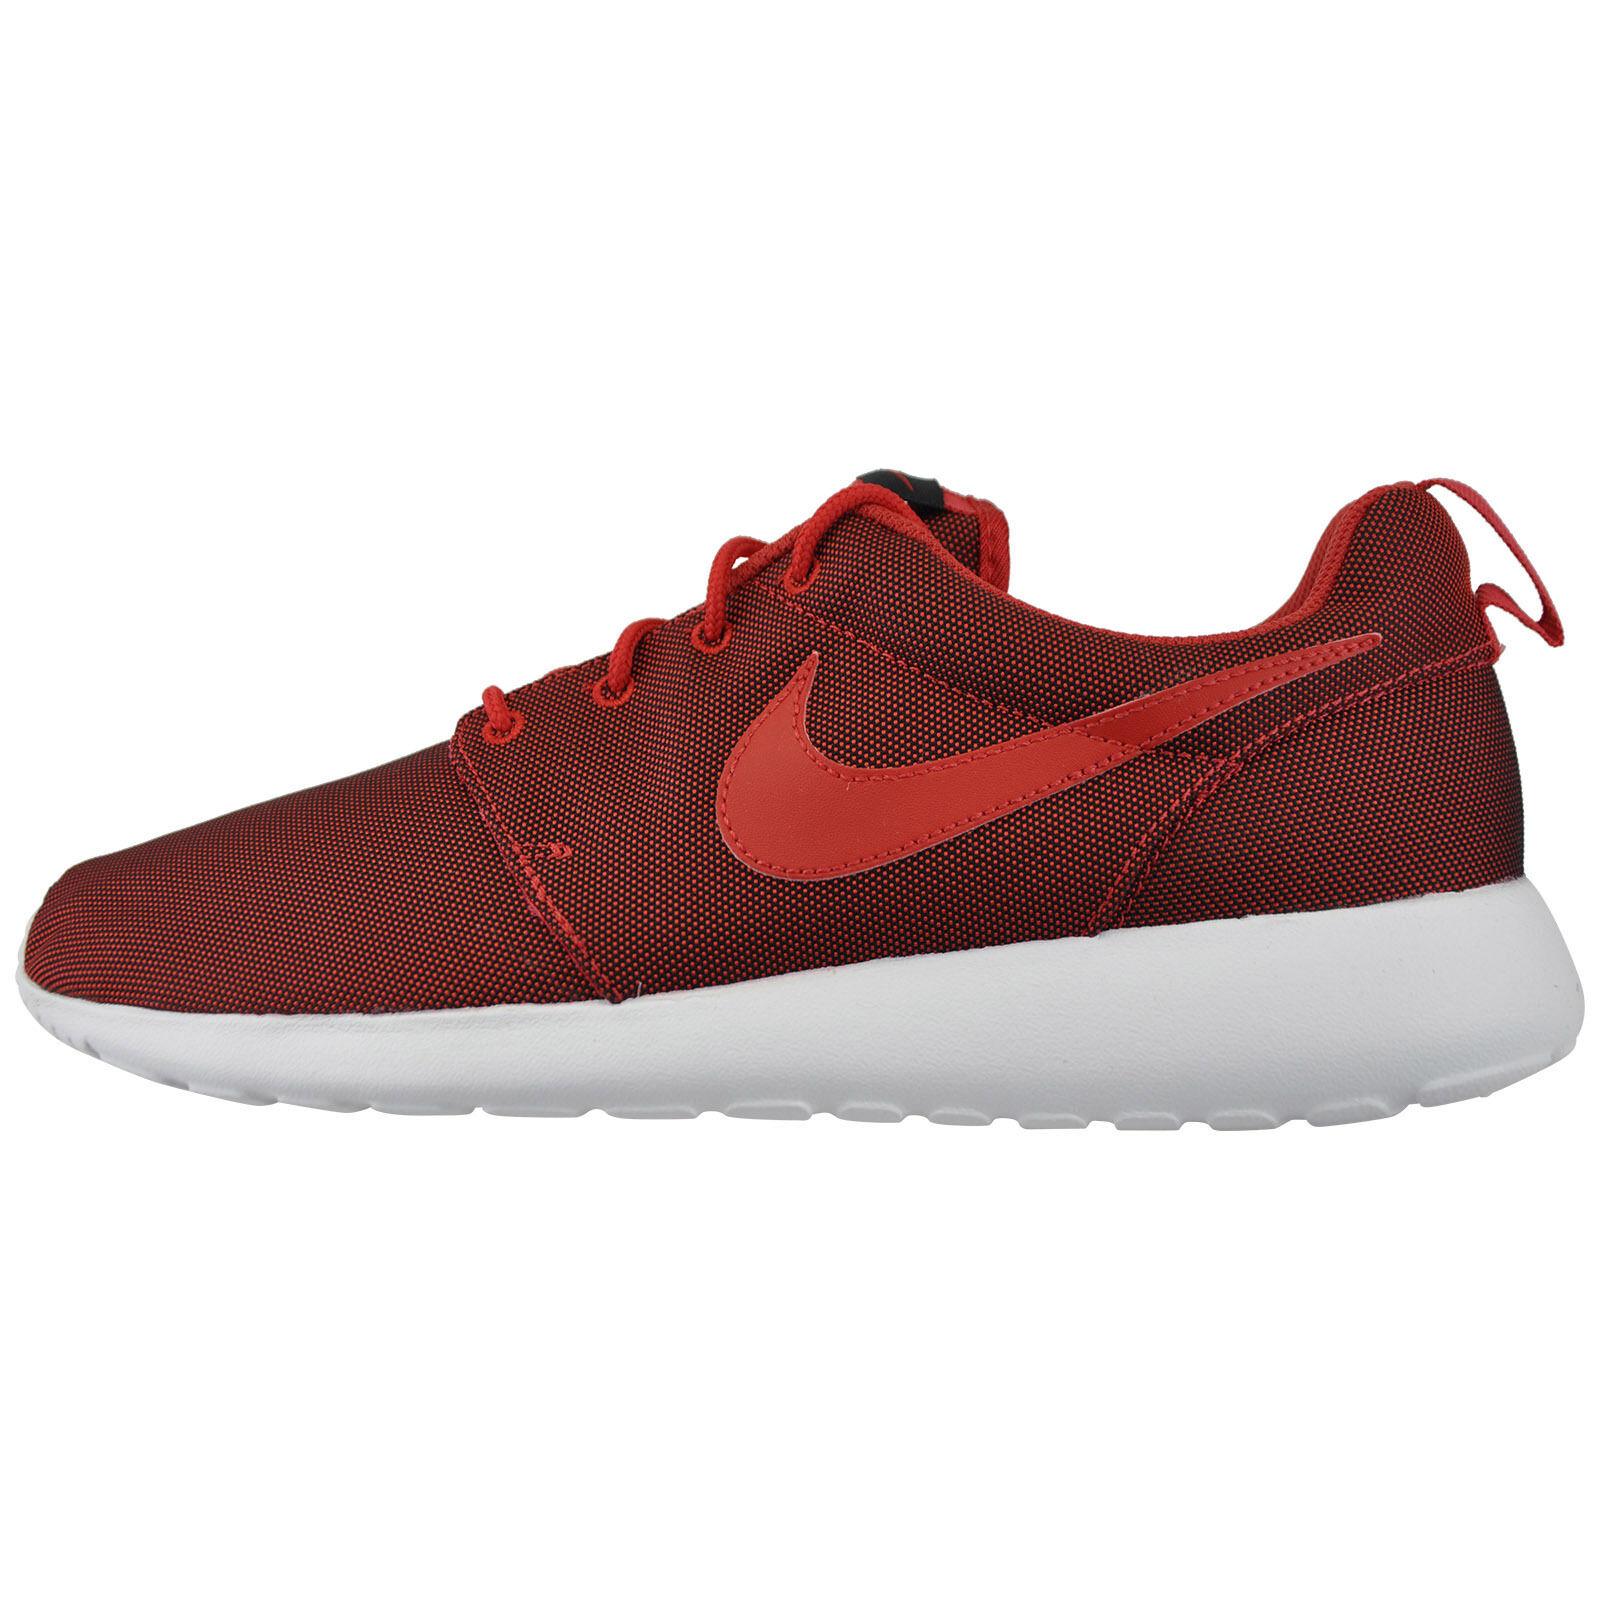 Nike Roshe One Premium 525234-660 Corsa Jogging   da Corsa  Casual